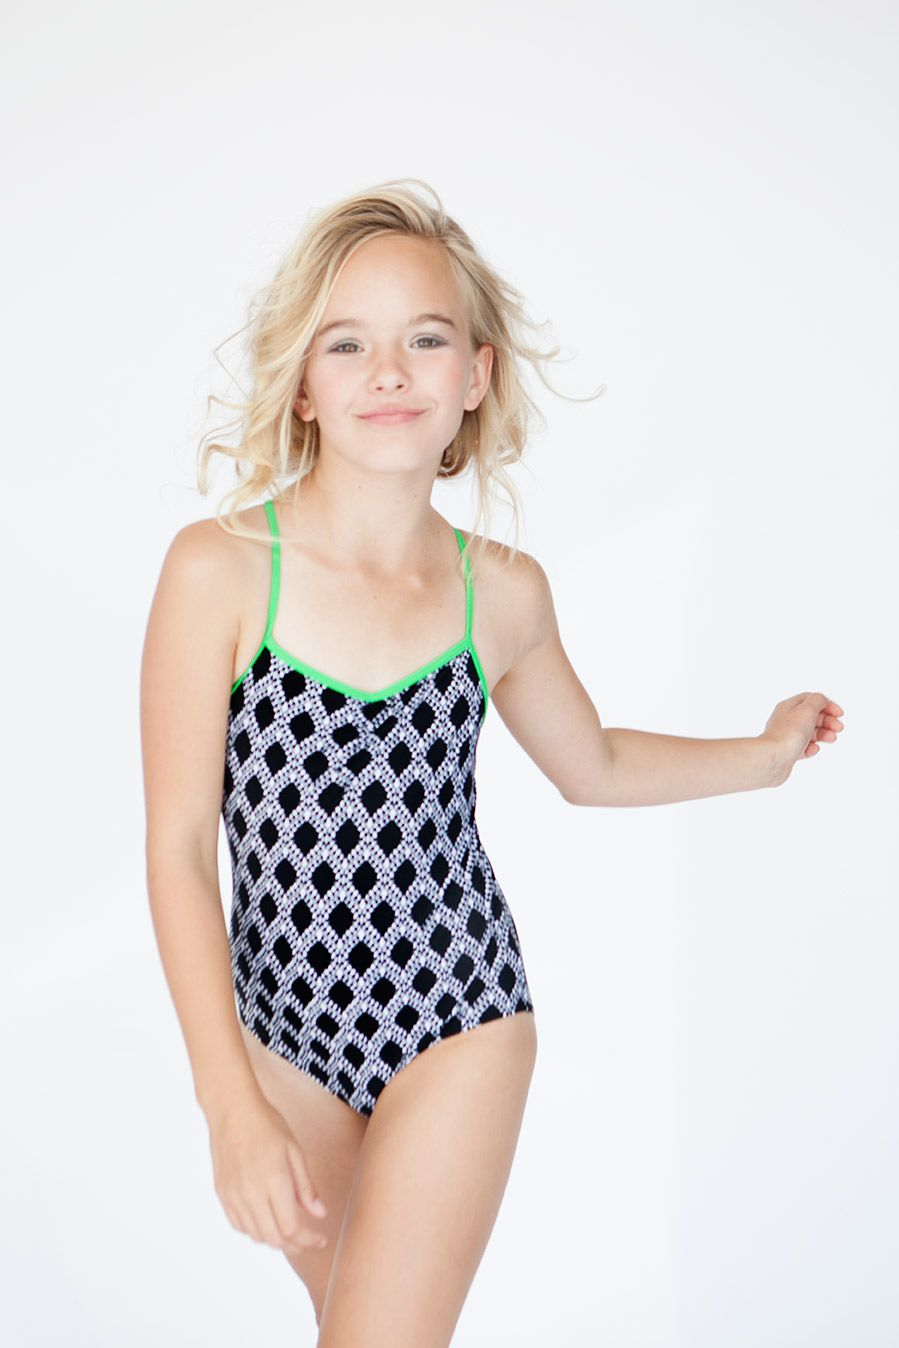 Ninos Traje De Bano Moda Infantil Trajes De Bano Chidlrens